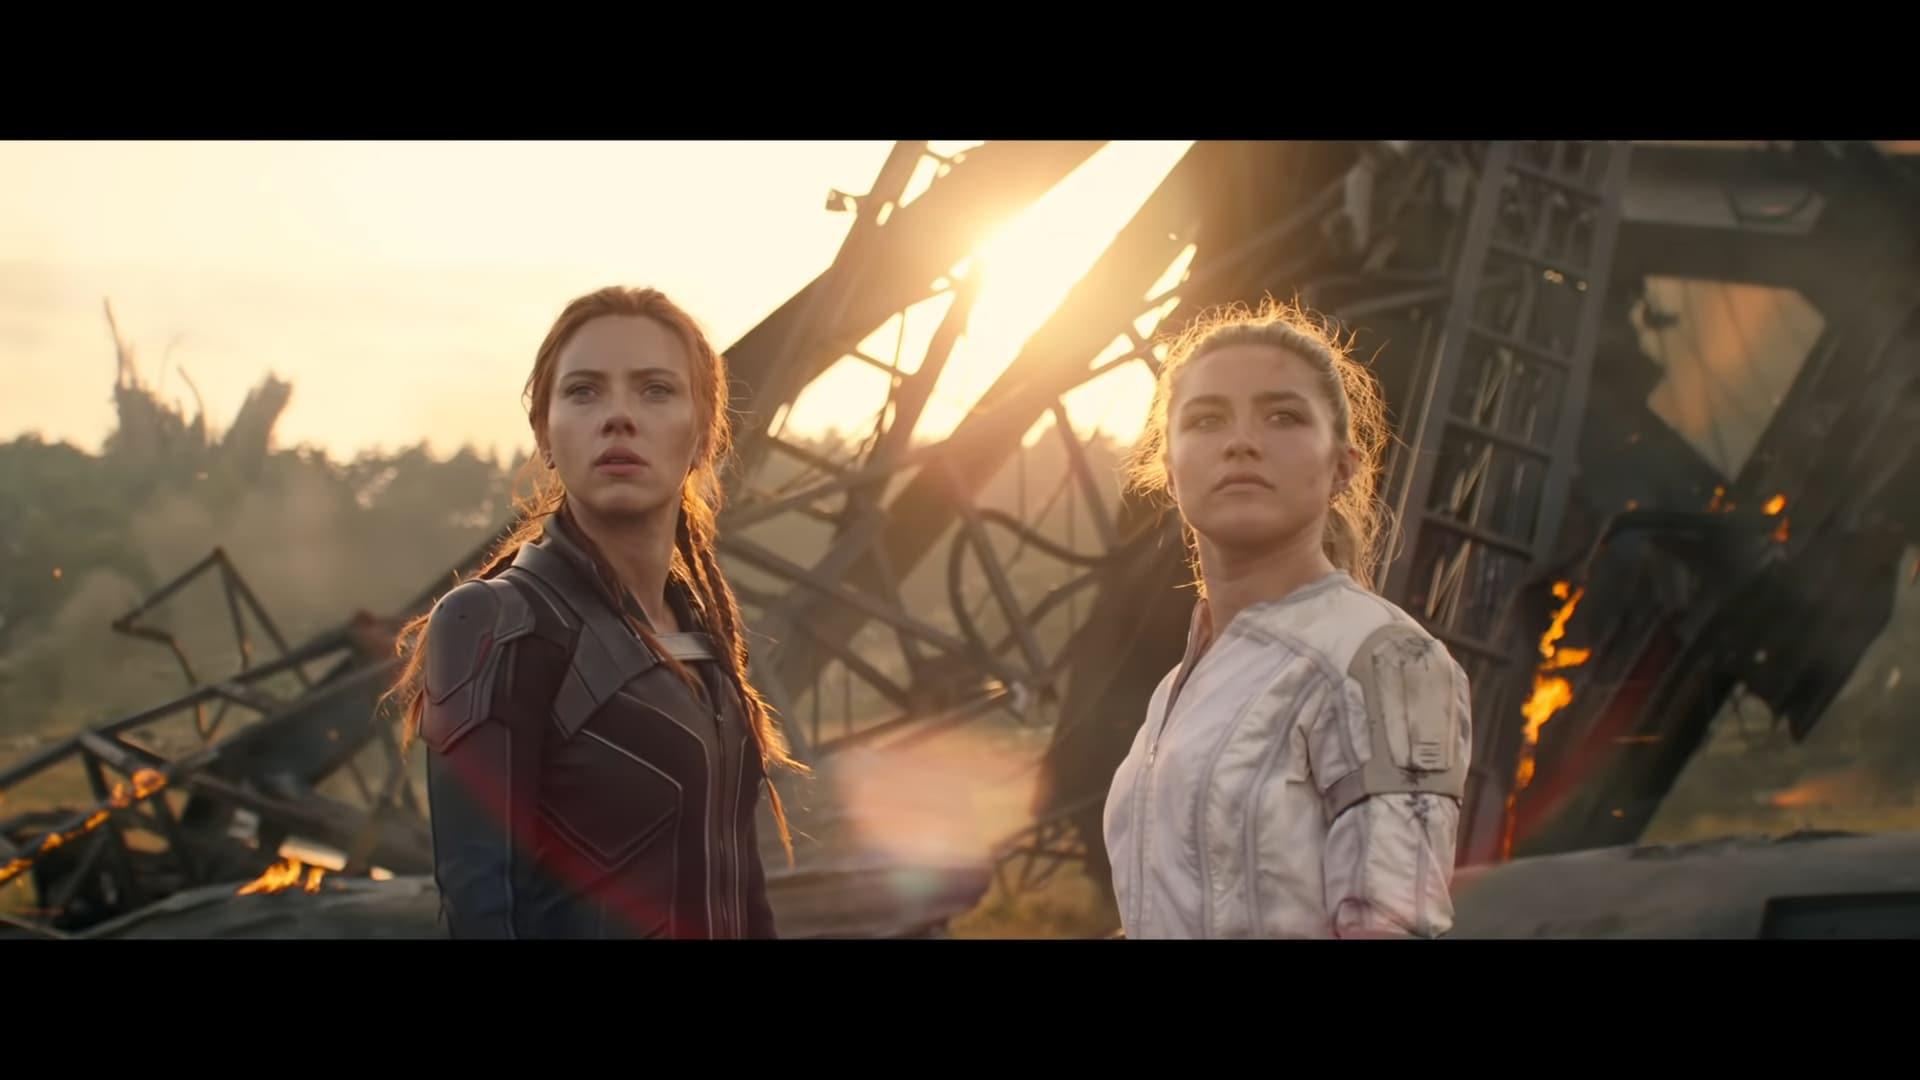 Una scena del film Marvel